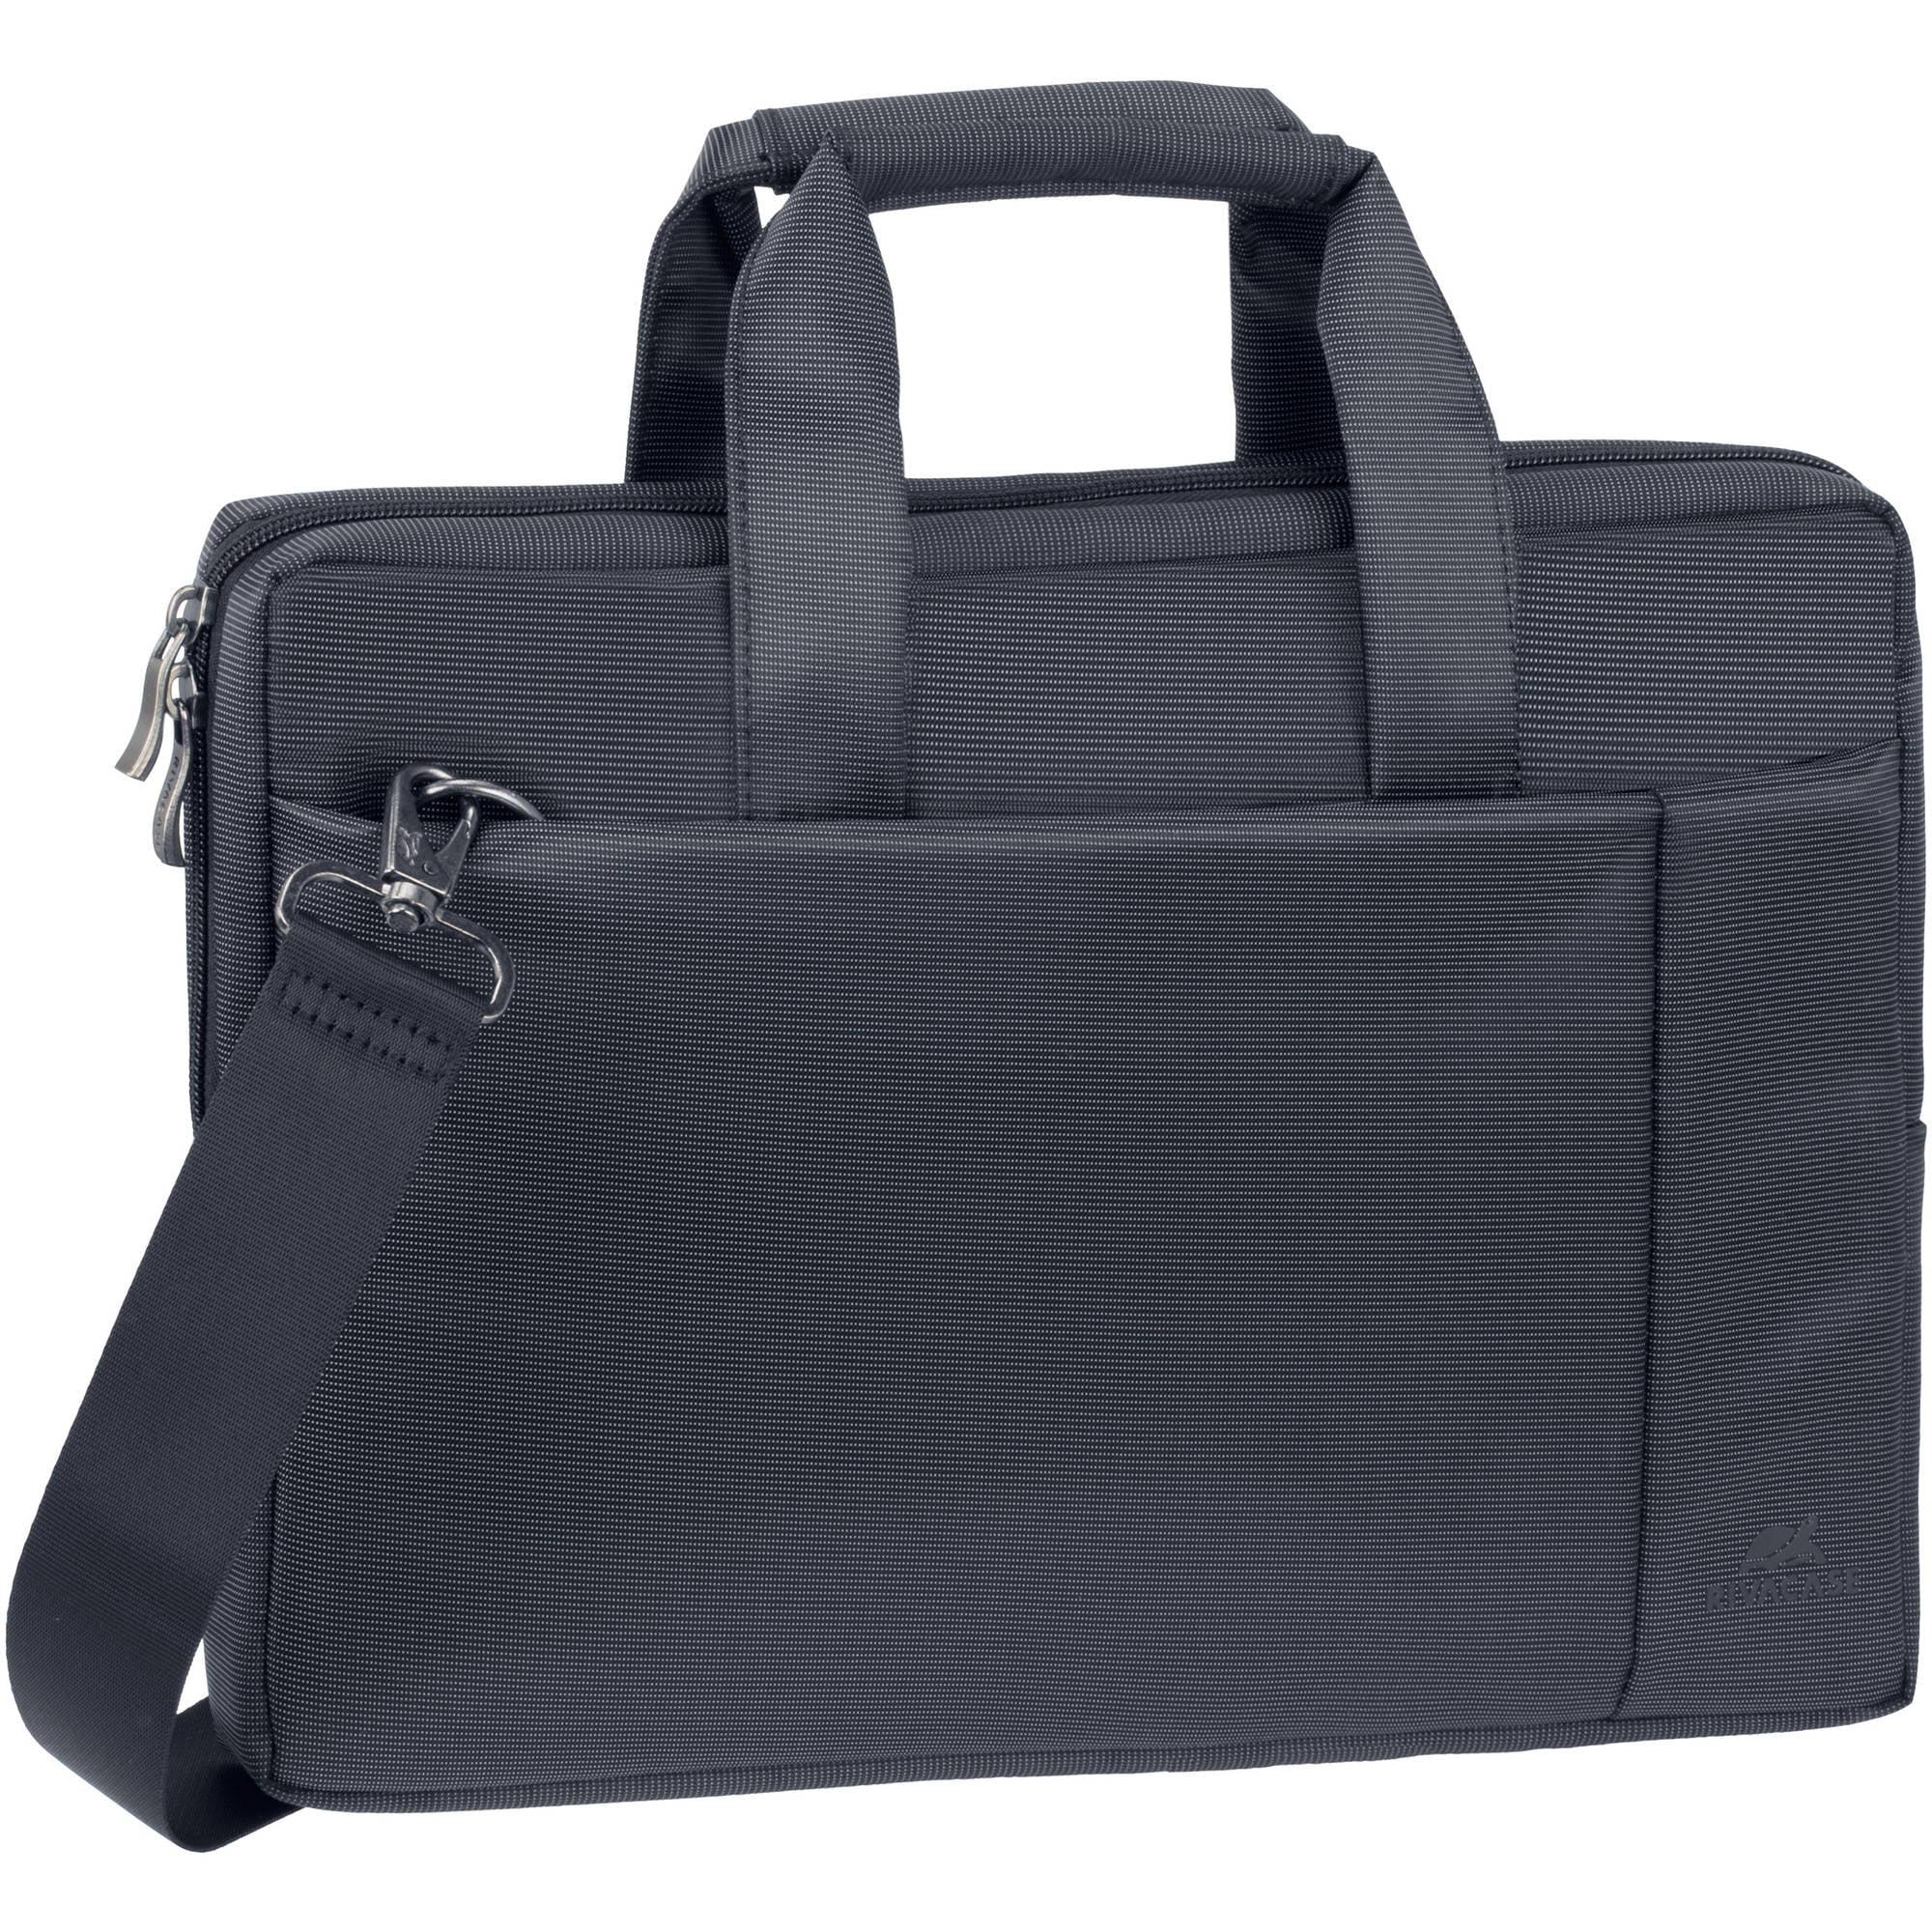 "RIVACASE 13.3"" Laptop Bag 8221, Black"